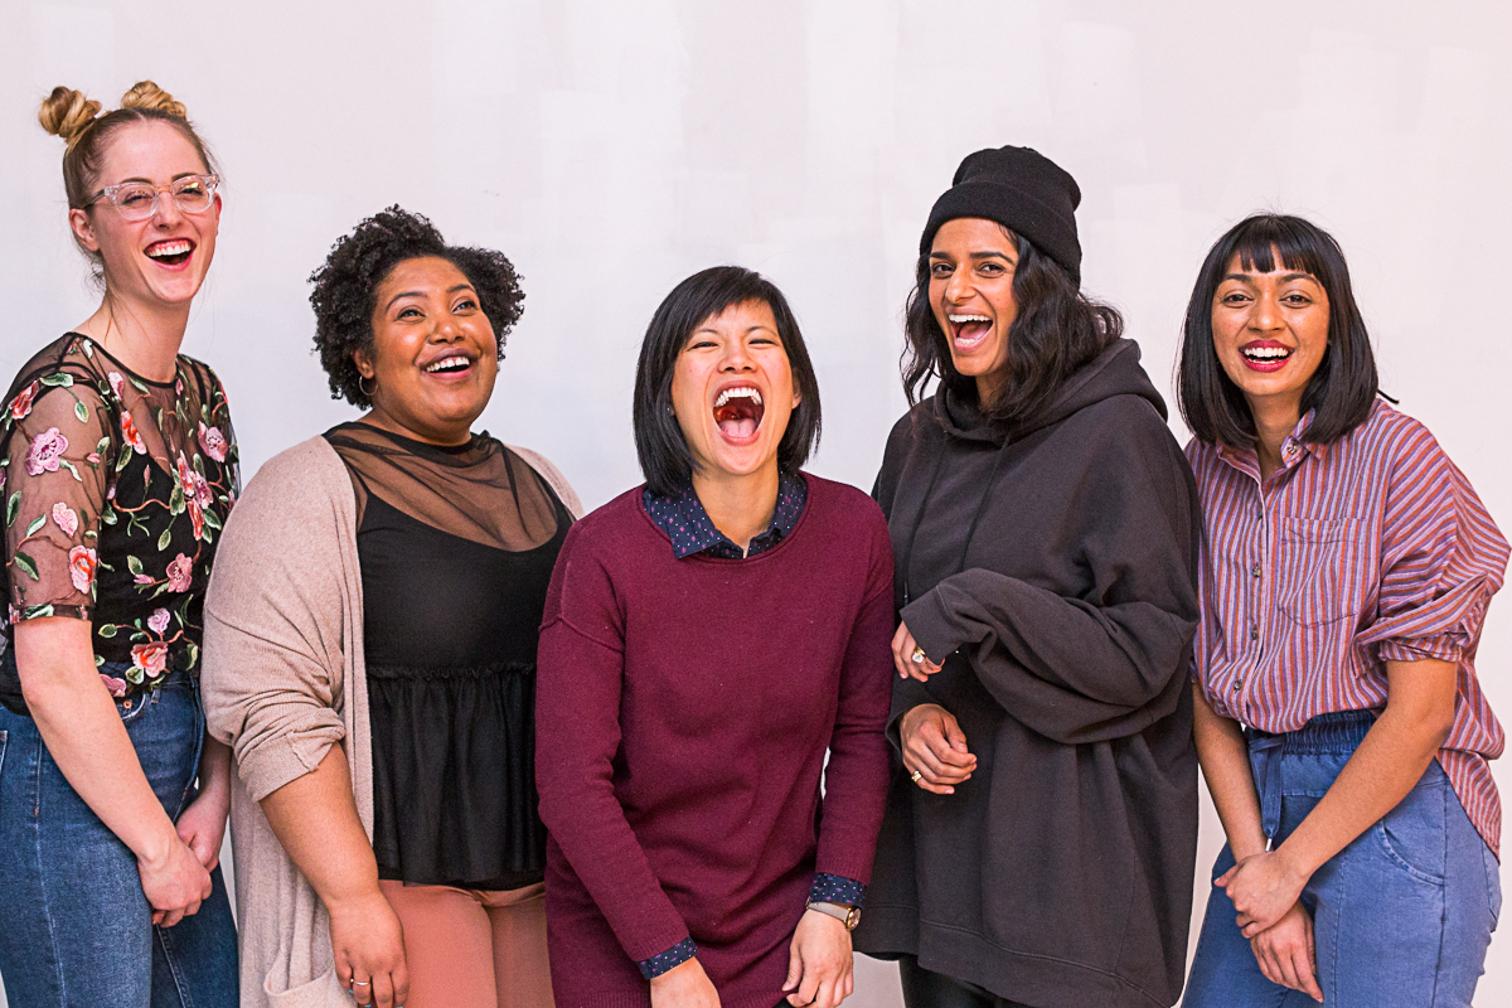 Syzygy Founders & Panelists: Marijke Large, Sulafa Silim, Jenna Tenn-Yuk, Tahsin The Good, and Kailah Bharath